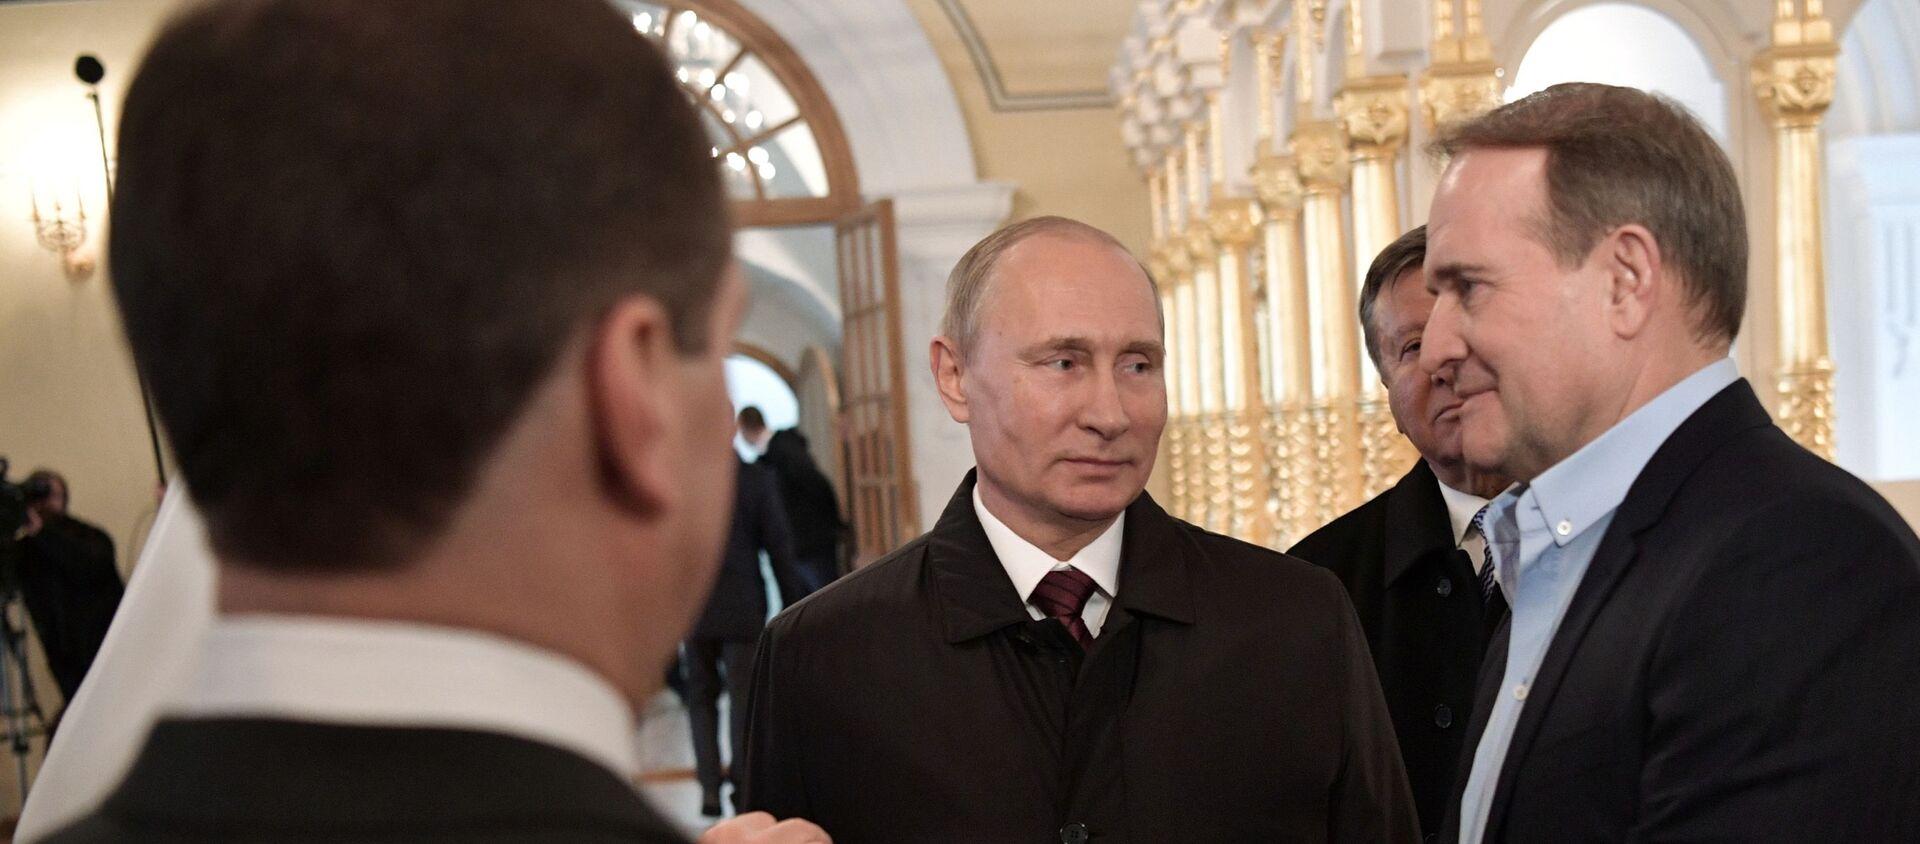 Predsednik Rusije Vladimir Putin i predstavnik Ukrajine za humanitarna pitanja kontakt-grupe Viktor Medvedčuk - Sputnik Srbija, 1920, 01.02.2021